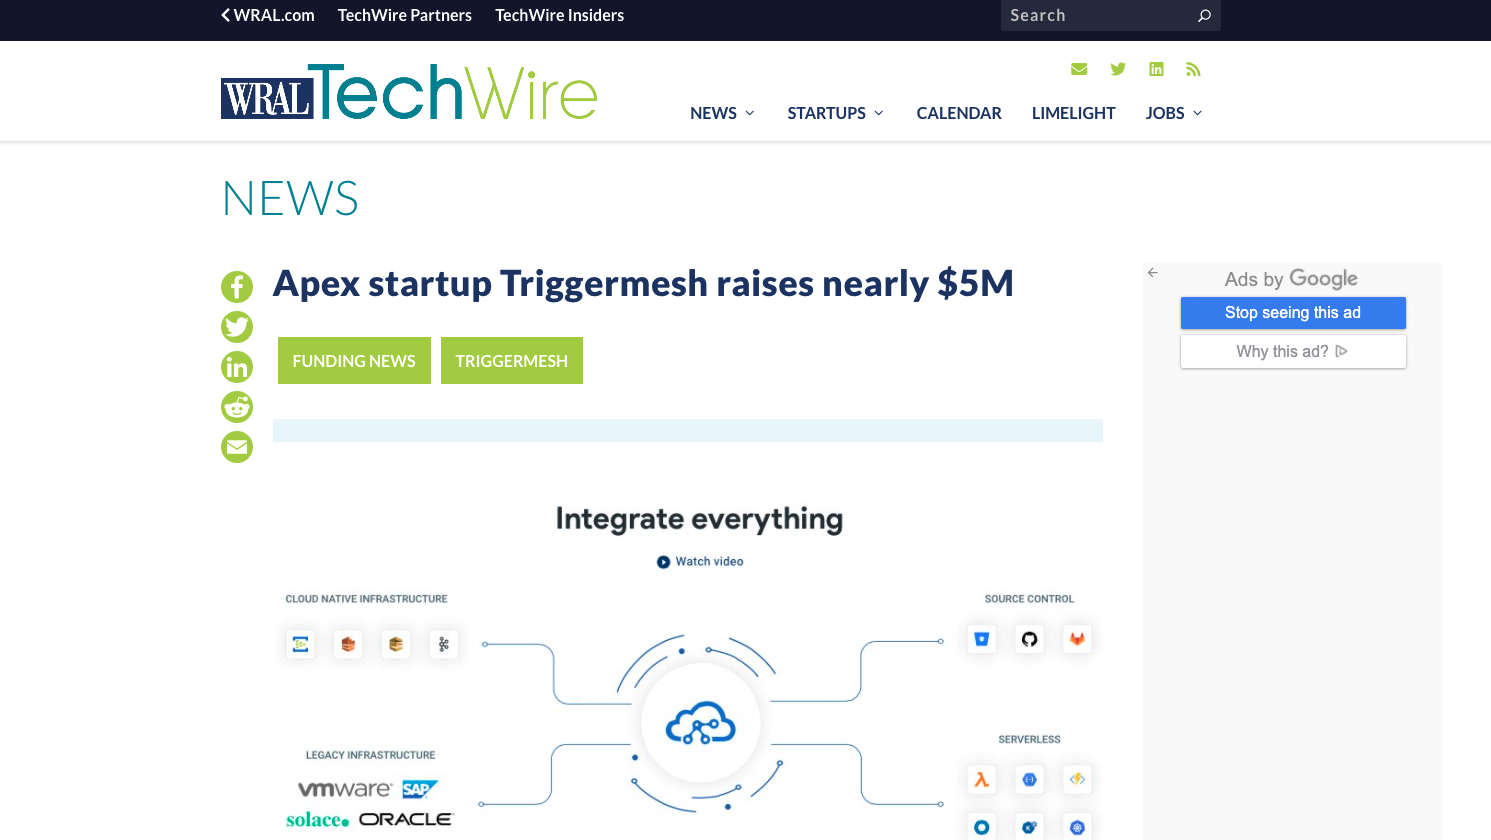 WRAL Tech Wire - Apex startup Triggermesh raises nearly $5M